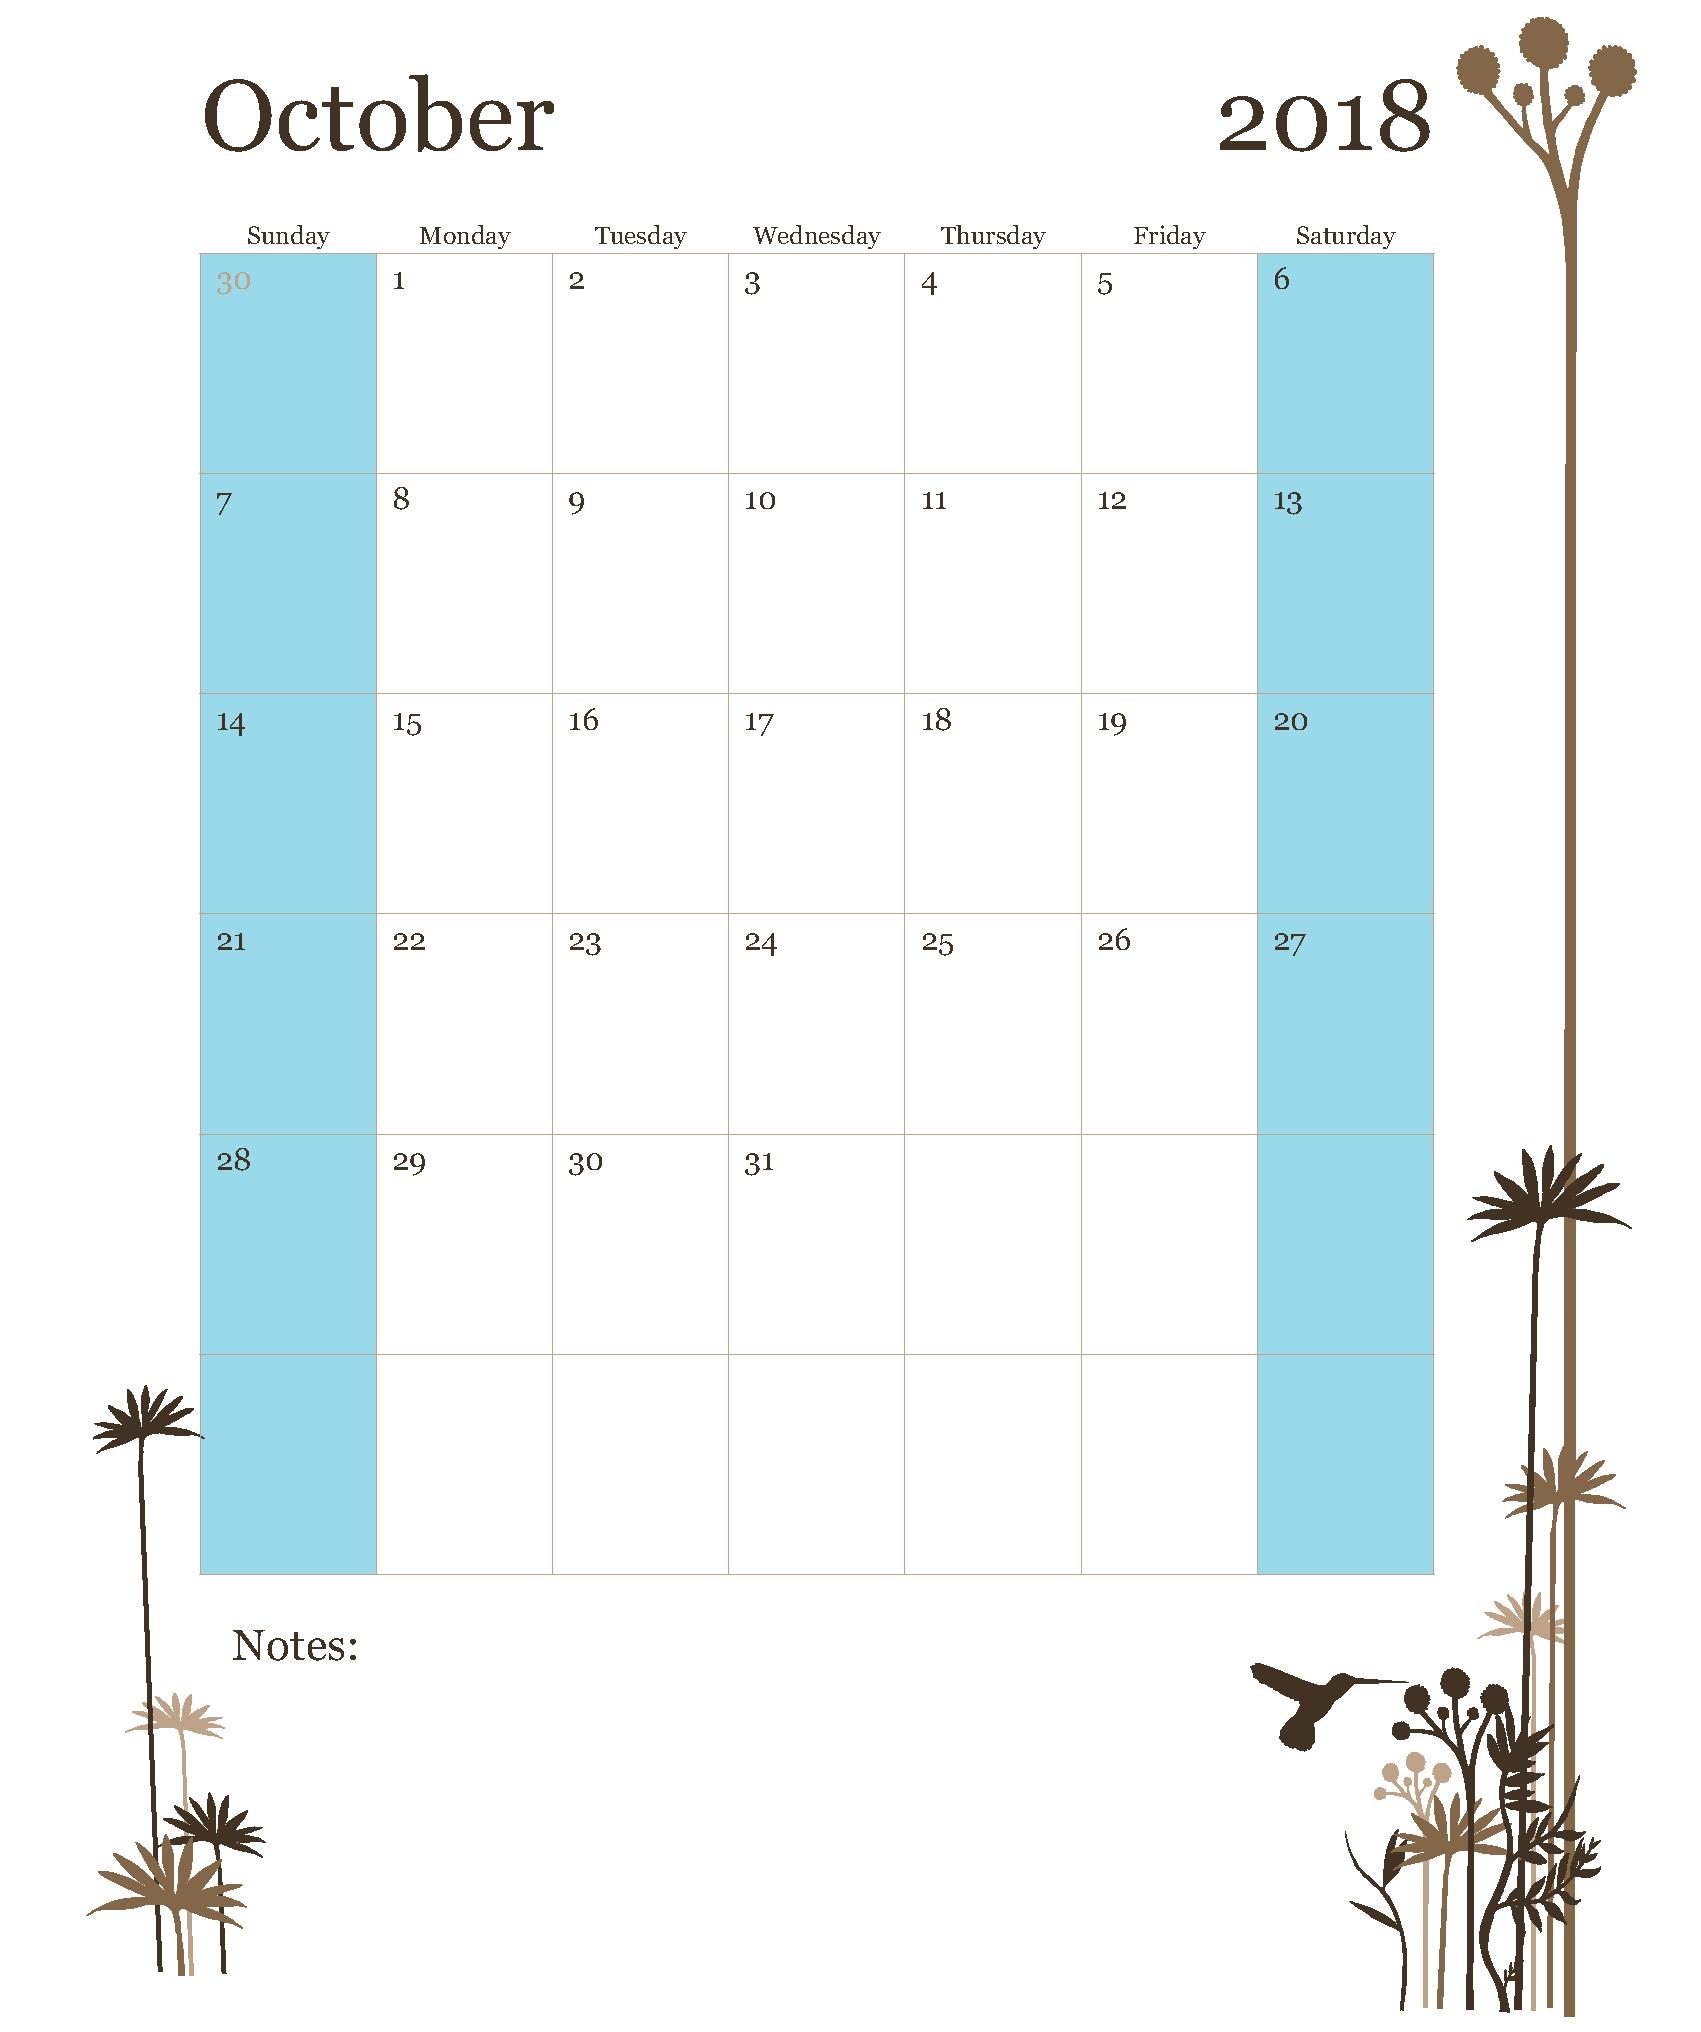 calendar october 2018 template free printable office templates Calendar October 2018 Template erdferdf